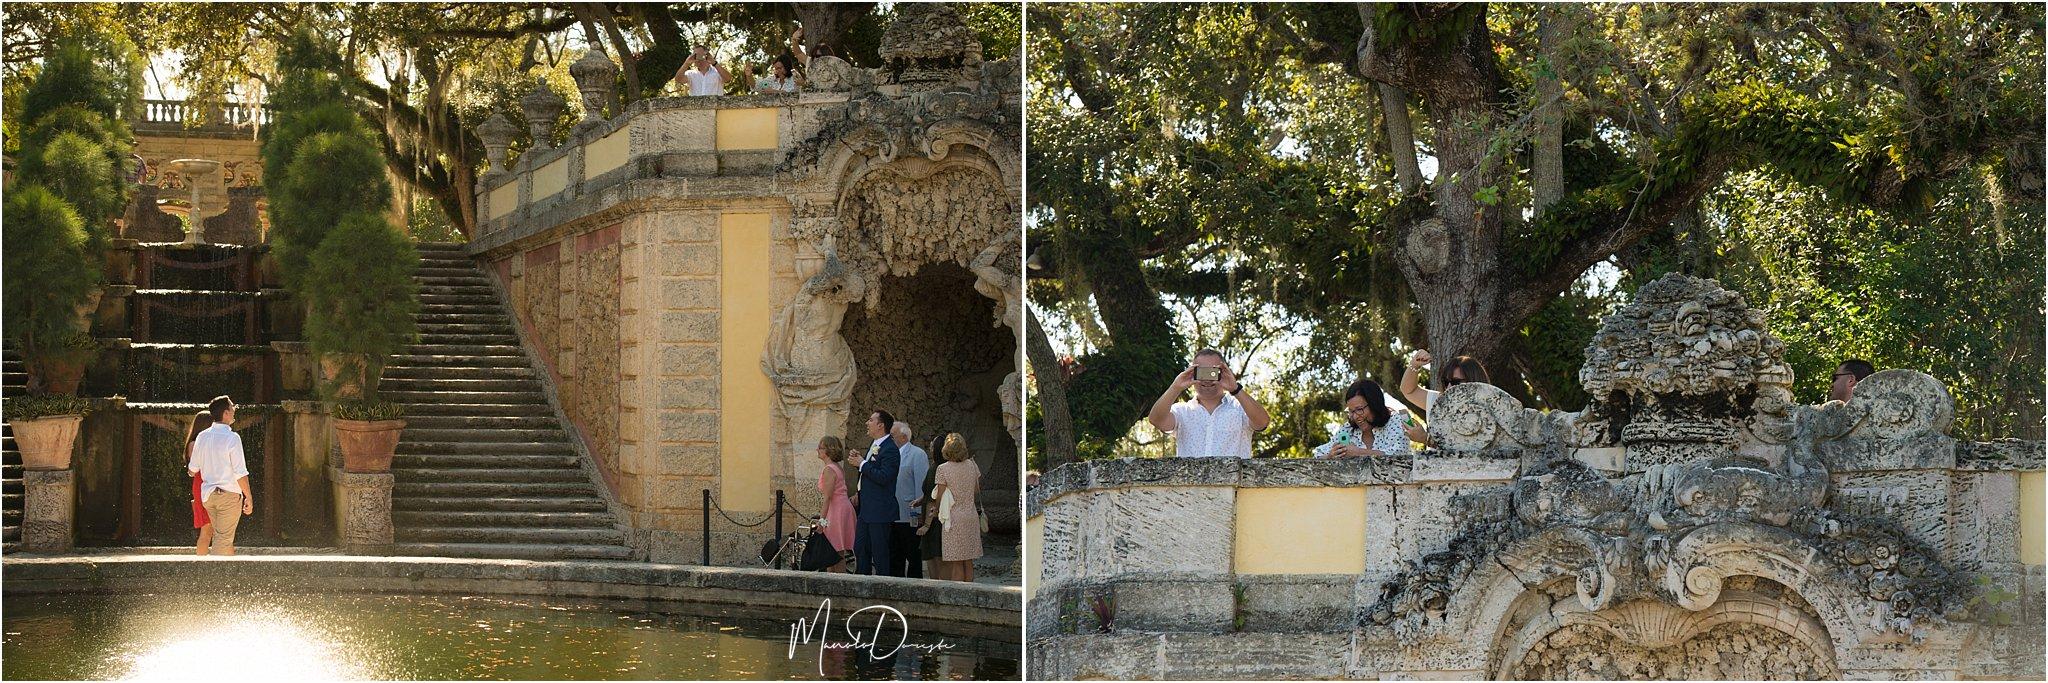 00855_ManoloDoreste_InFocusStudios_Wedding_Family_Photography_Miami_MiamiPhotographer.jpg